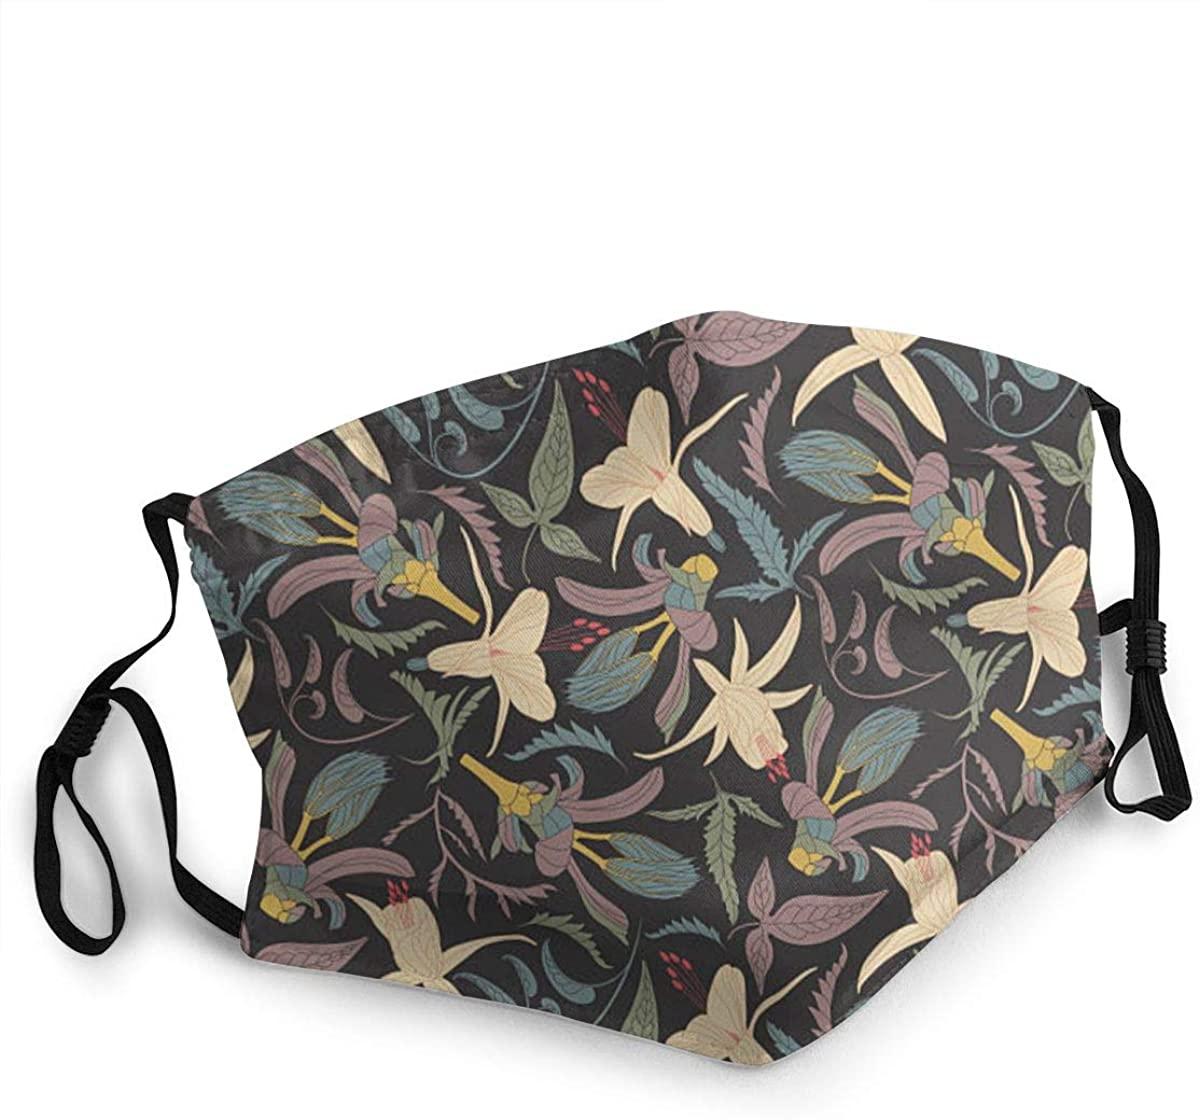 Fashion Protective Face Masks, Flowers and Leaves Unisex Dust Mouth Masks, Washable, Reusable Masks